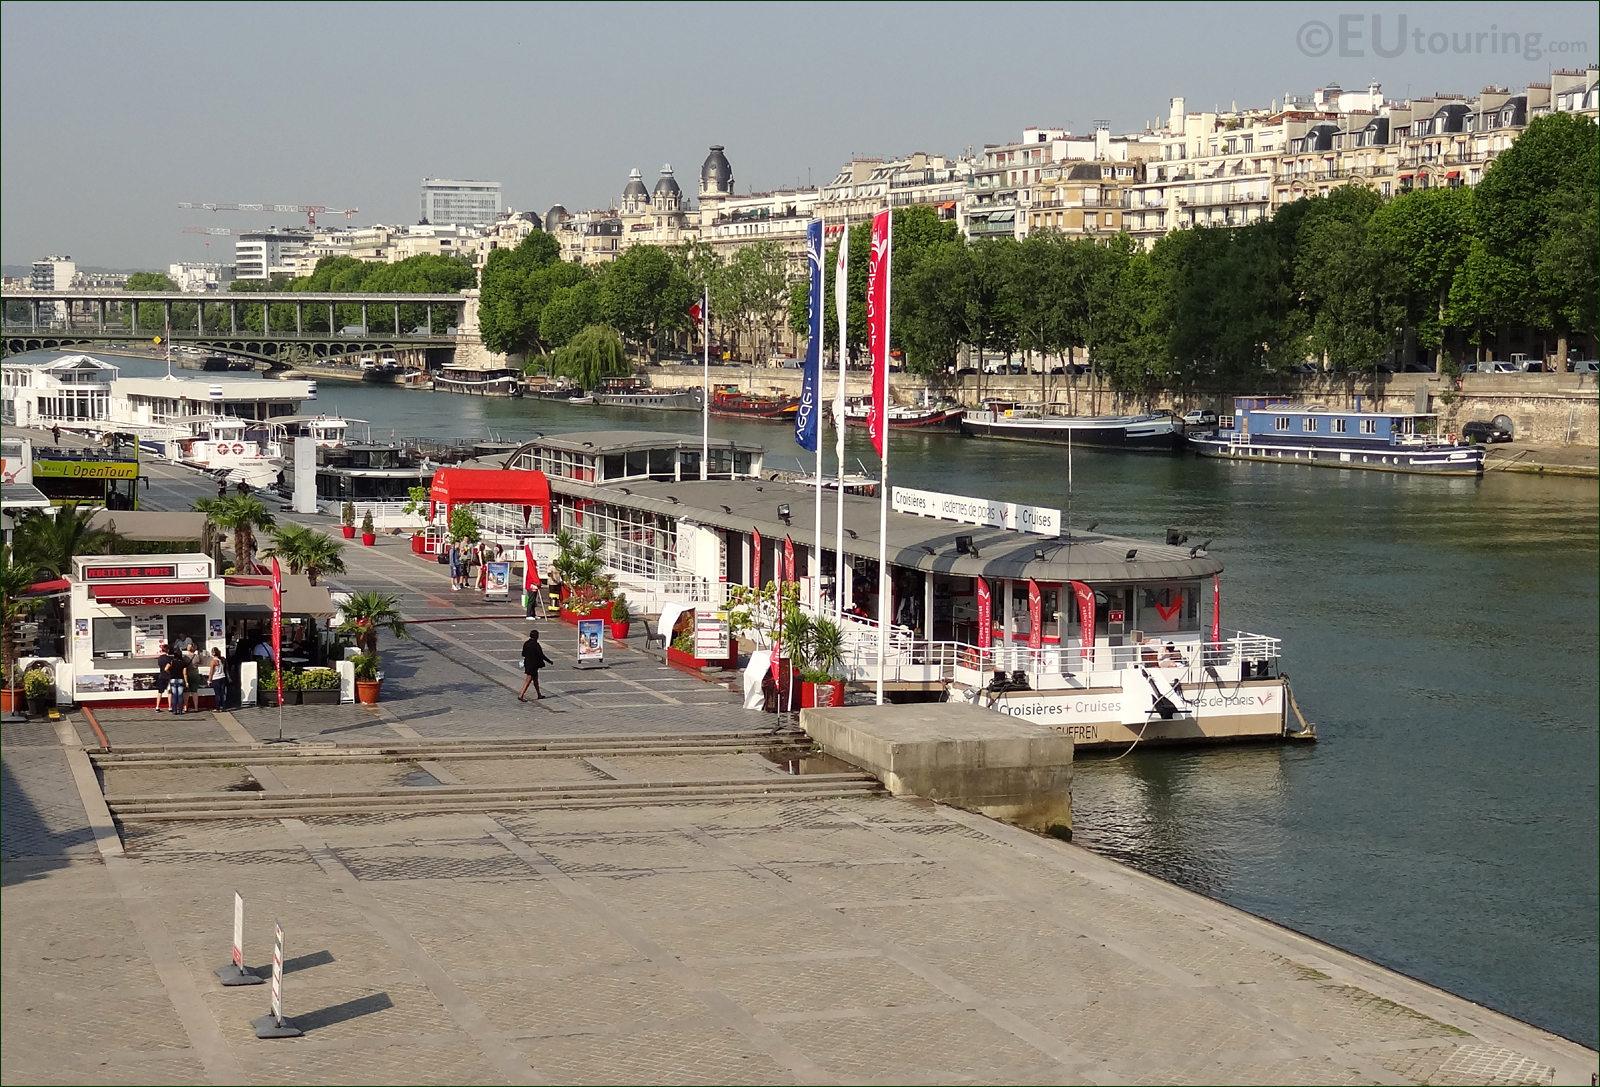 Hd photos of the vedettes de paris sightseeing cruise - Restaurant seine port ...